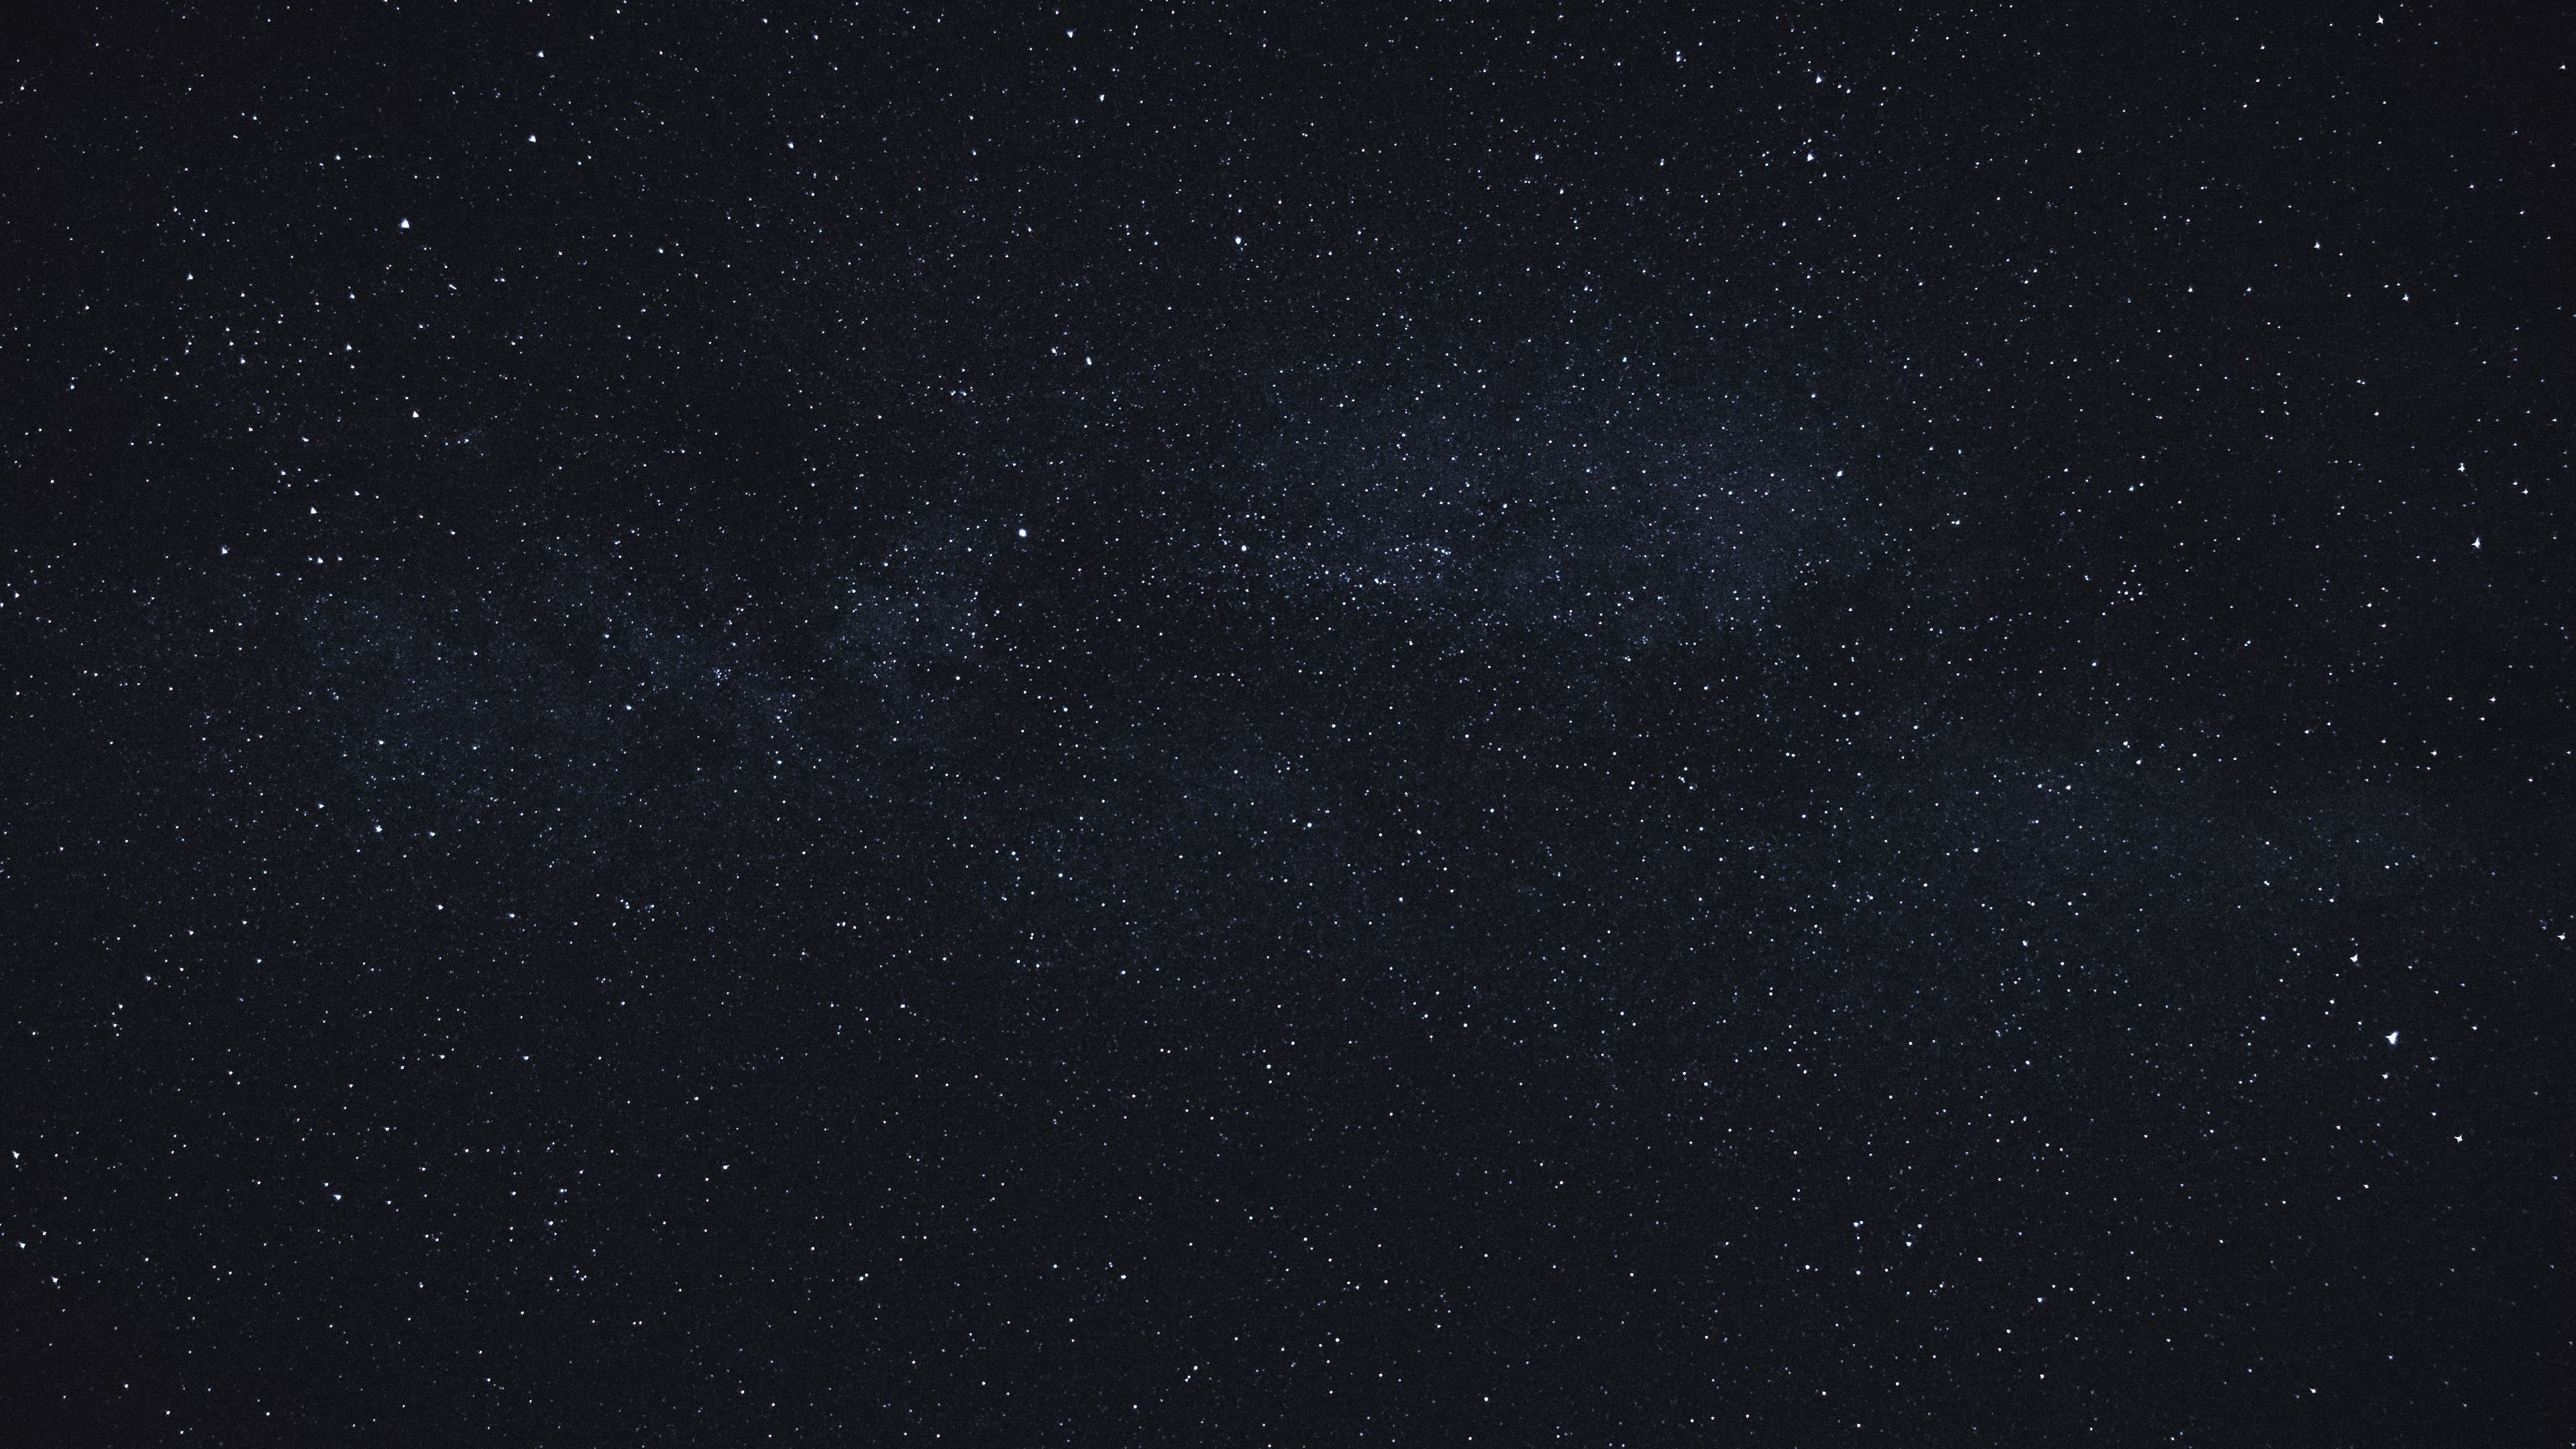 Dark Milky Way Galaxy 4k Stars Wallpapers Nature Wallpapers Milky Way Wallpapers Hd Wallpapers Galaxy Wall Milky Way Galaxy Star Wallpaper Galaxy Wallpaper